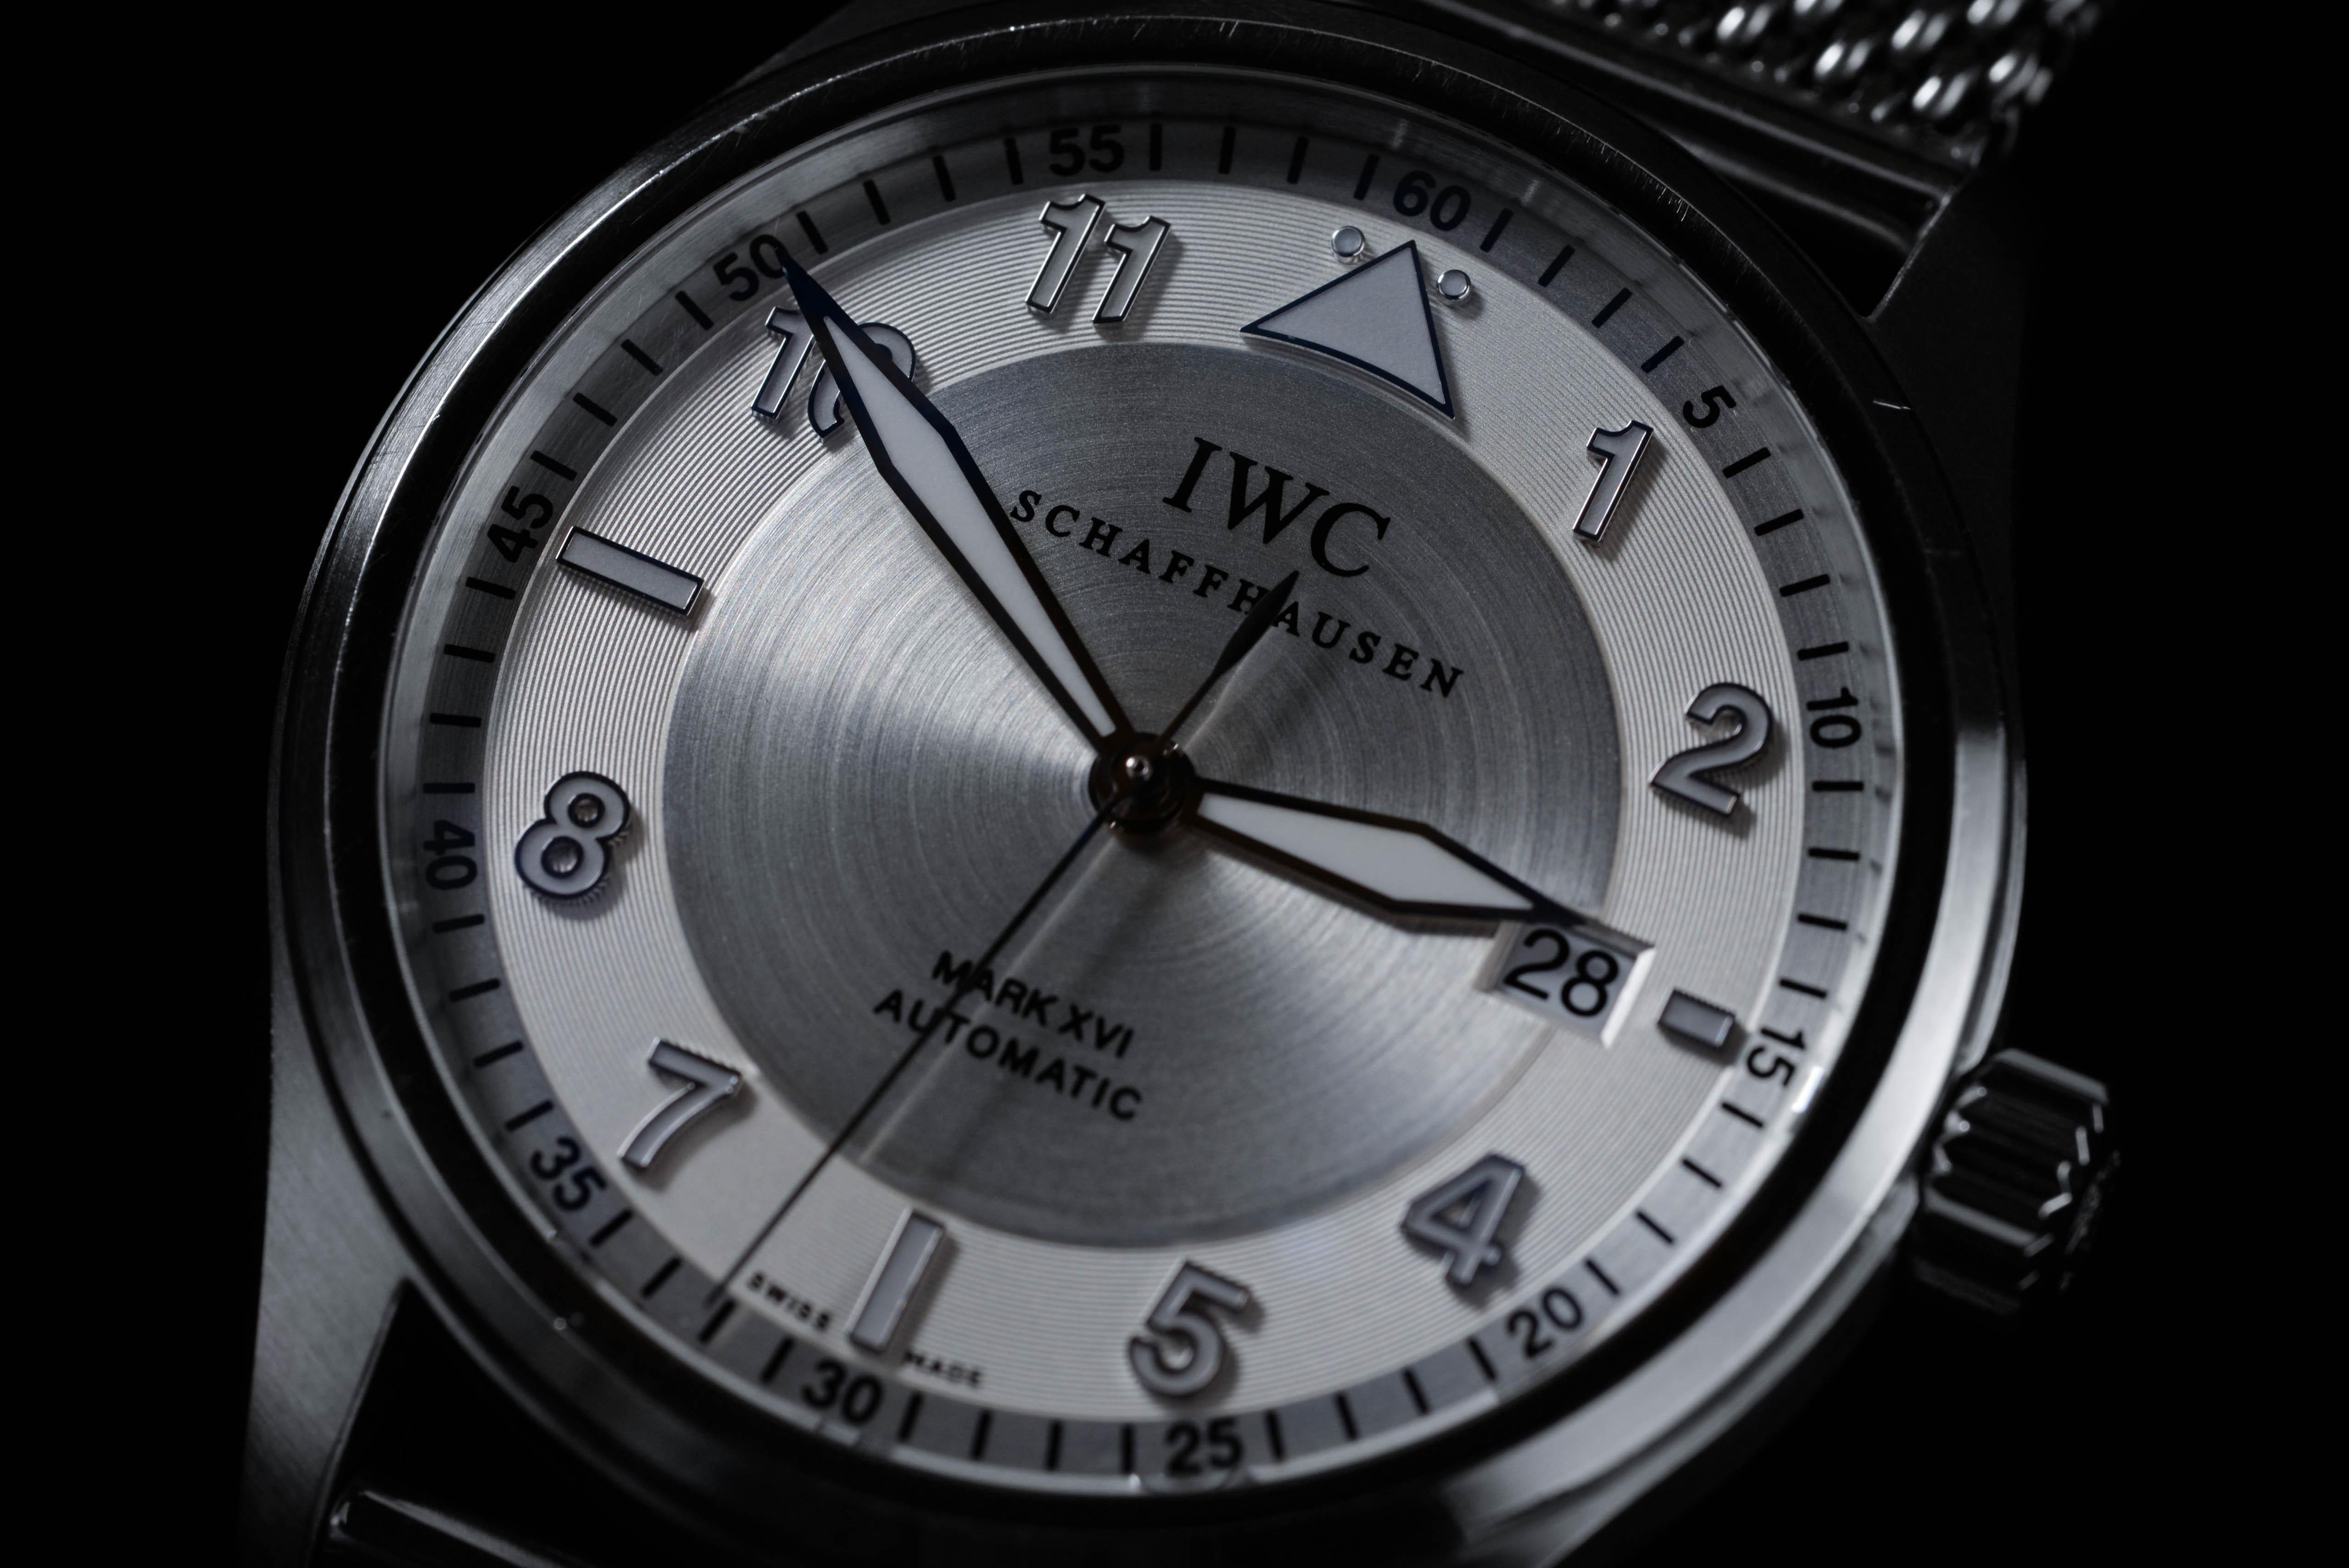 IWC スピットファイア マーク16 Ref.325502